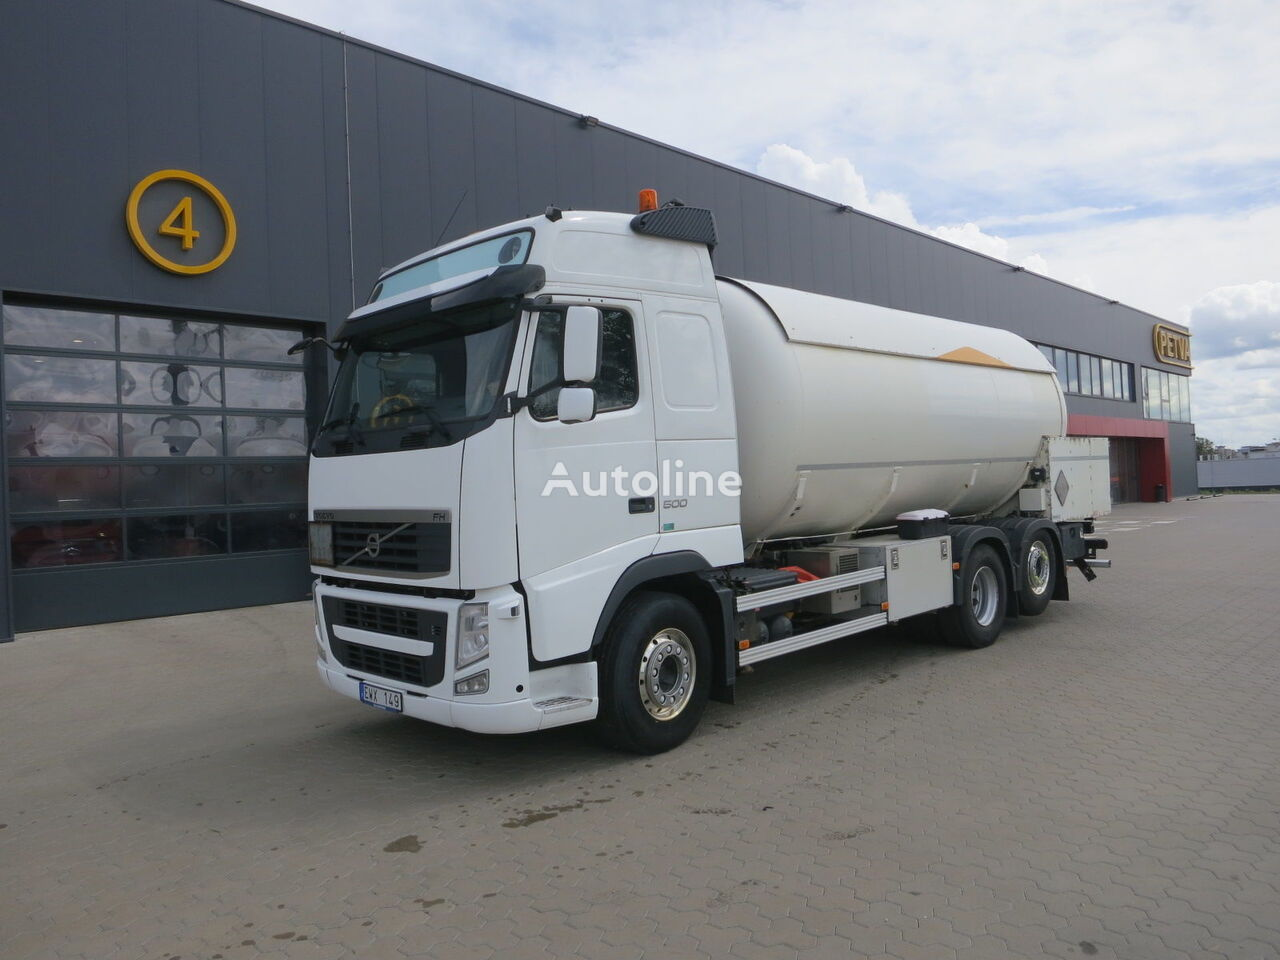 VOLVO FH 13.500, 26 000 liter. ADR Gastransporter LKW